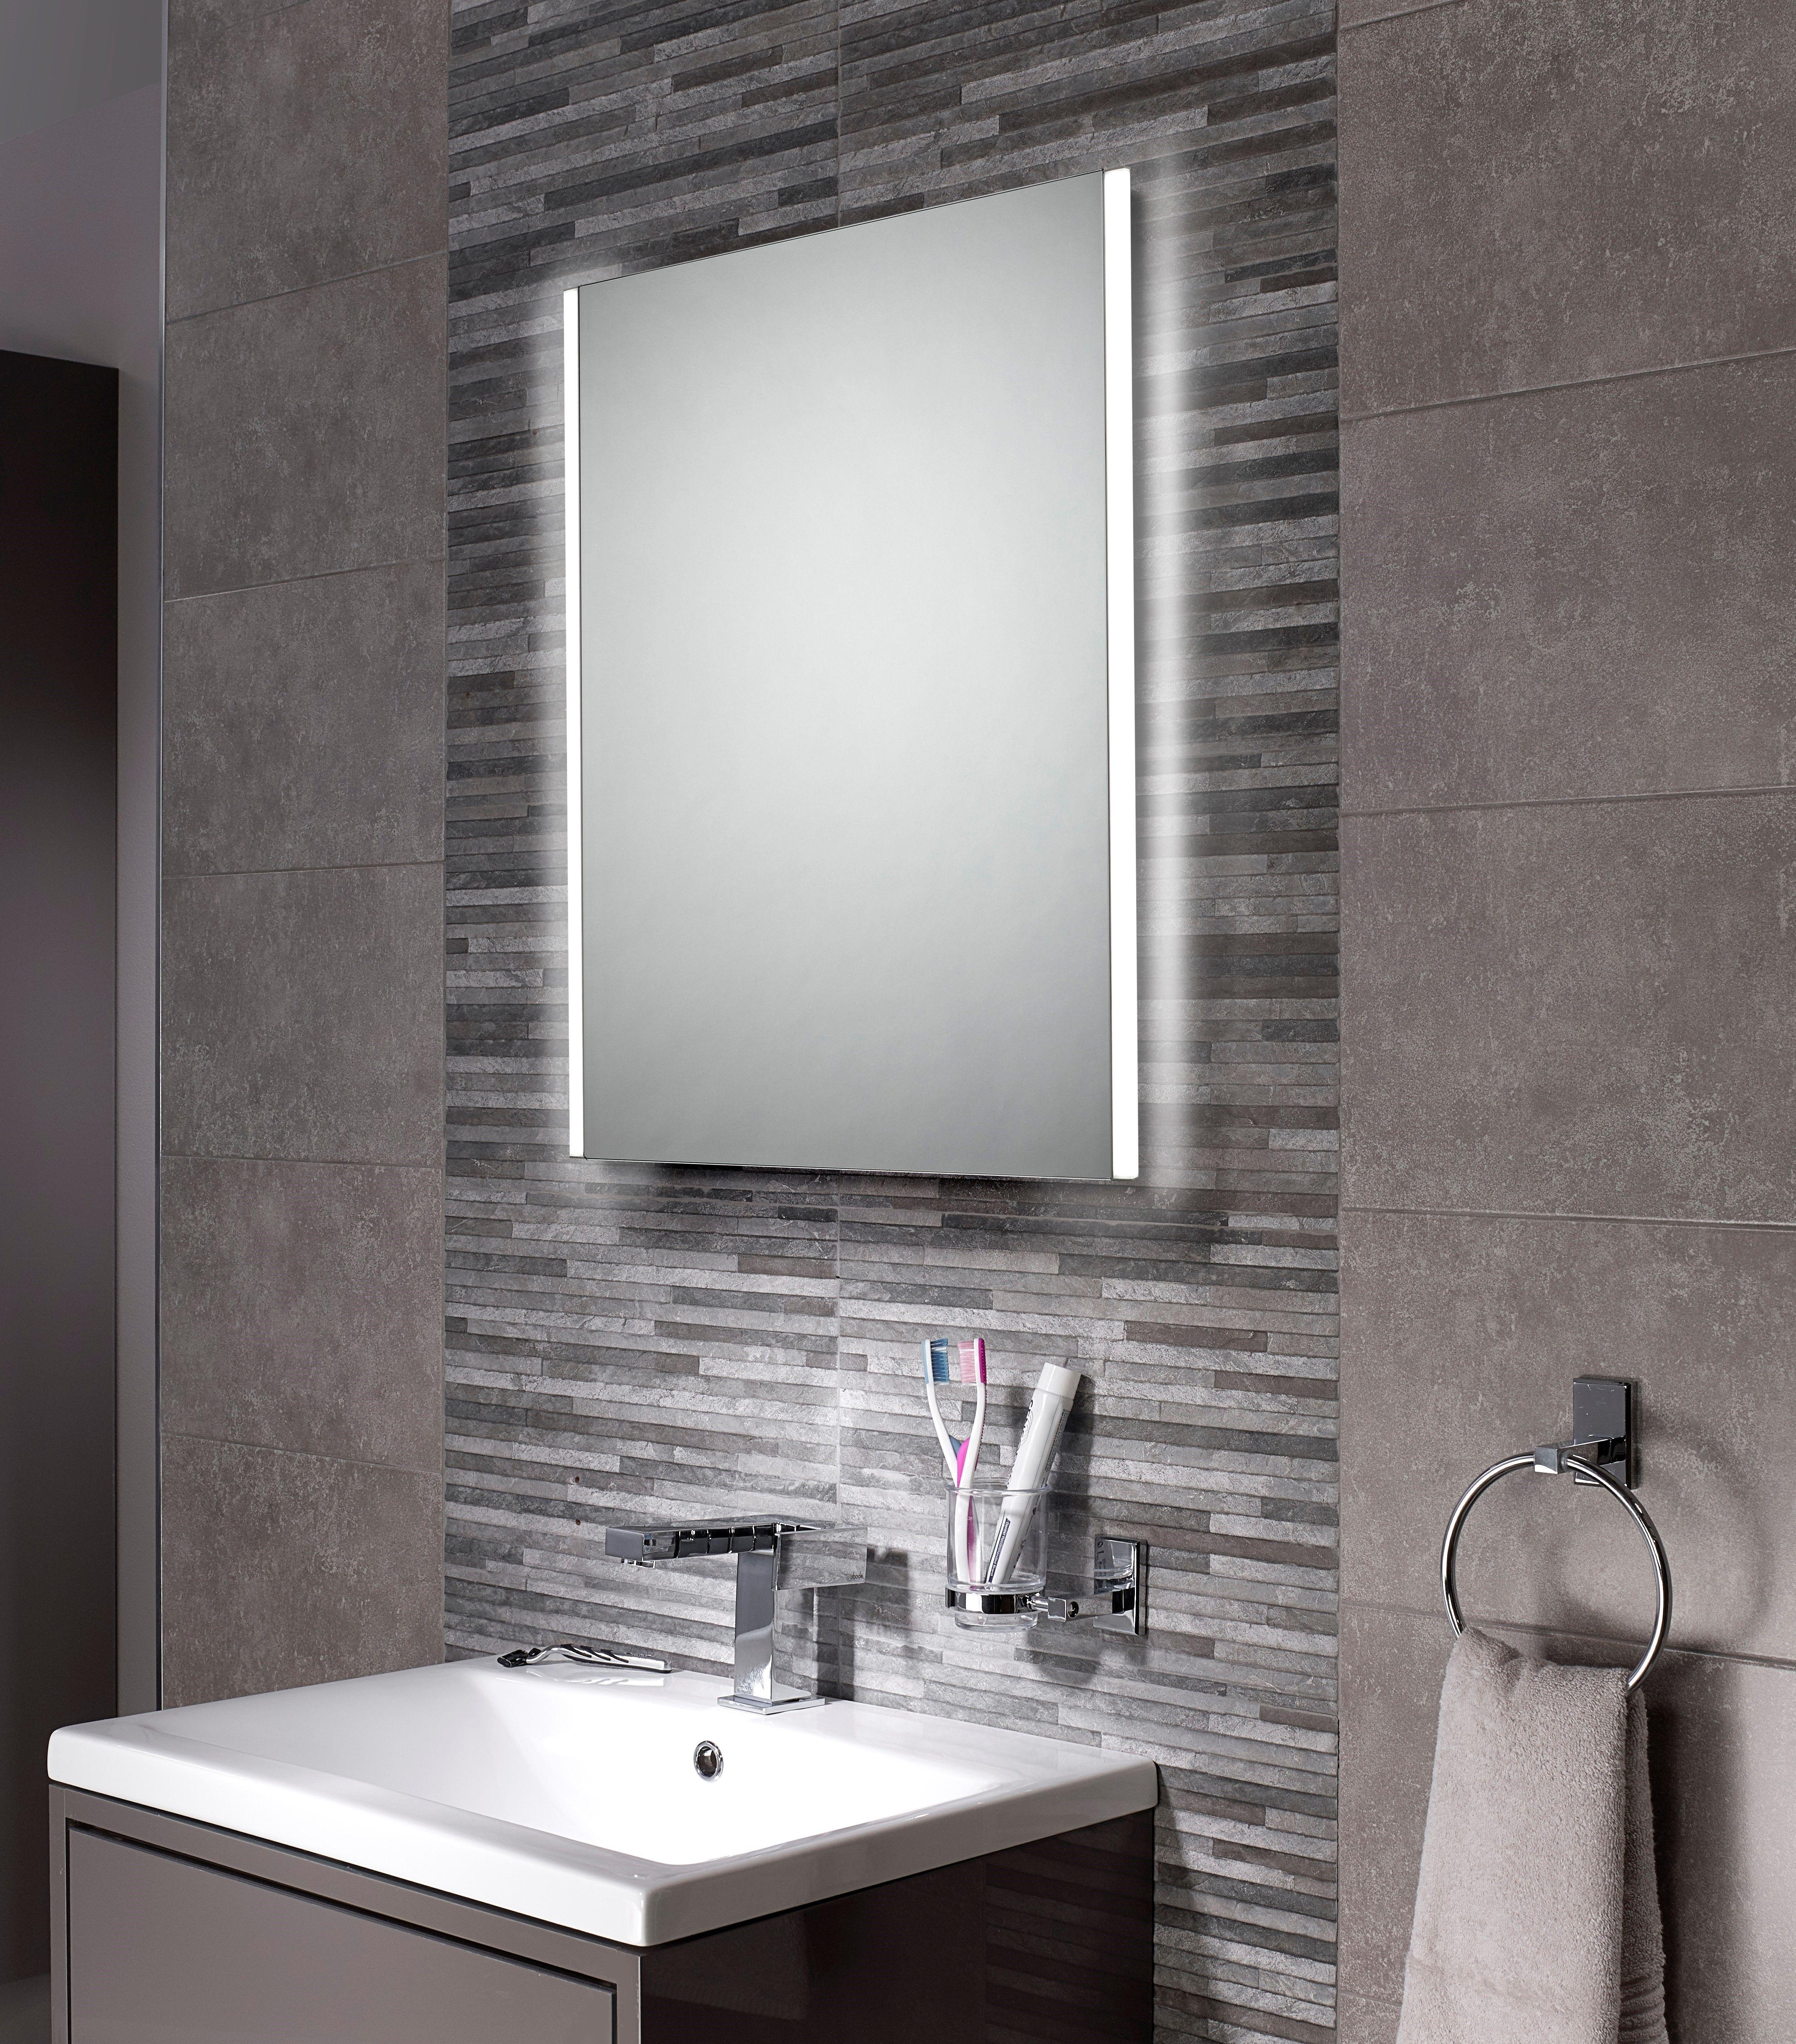 Carina Led Illuminated Bathroom Mirror With Demister Pads 390 X